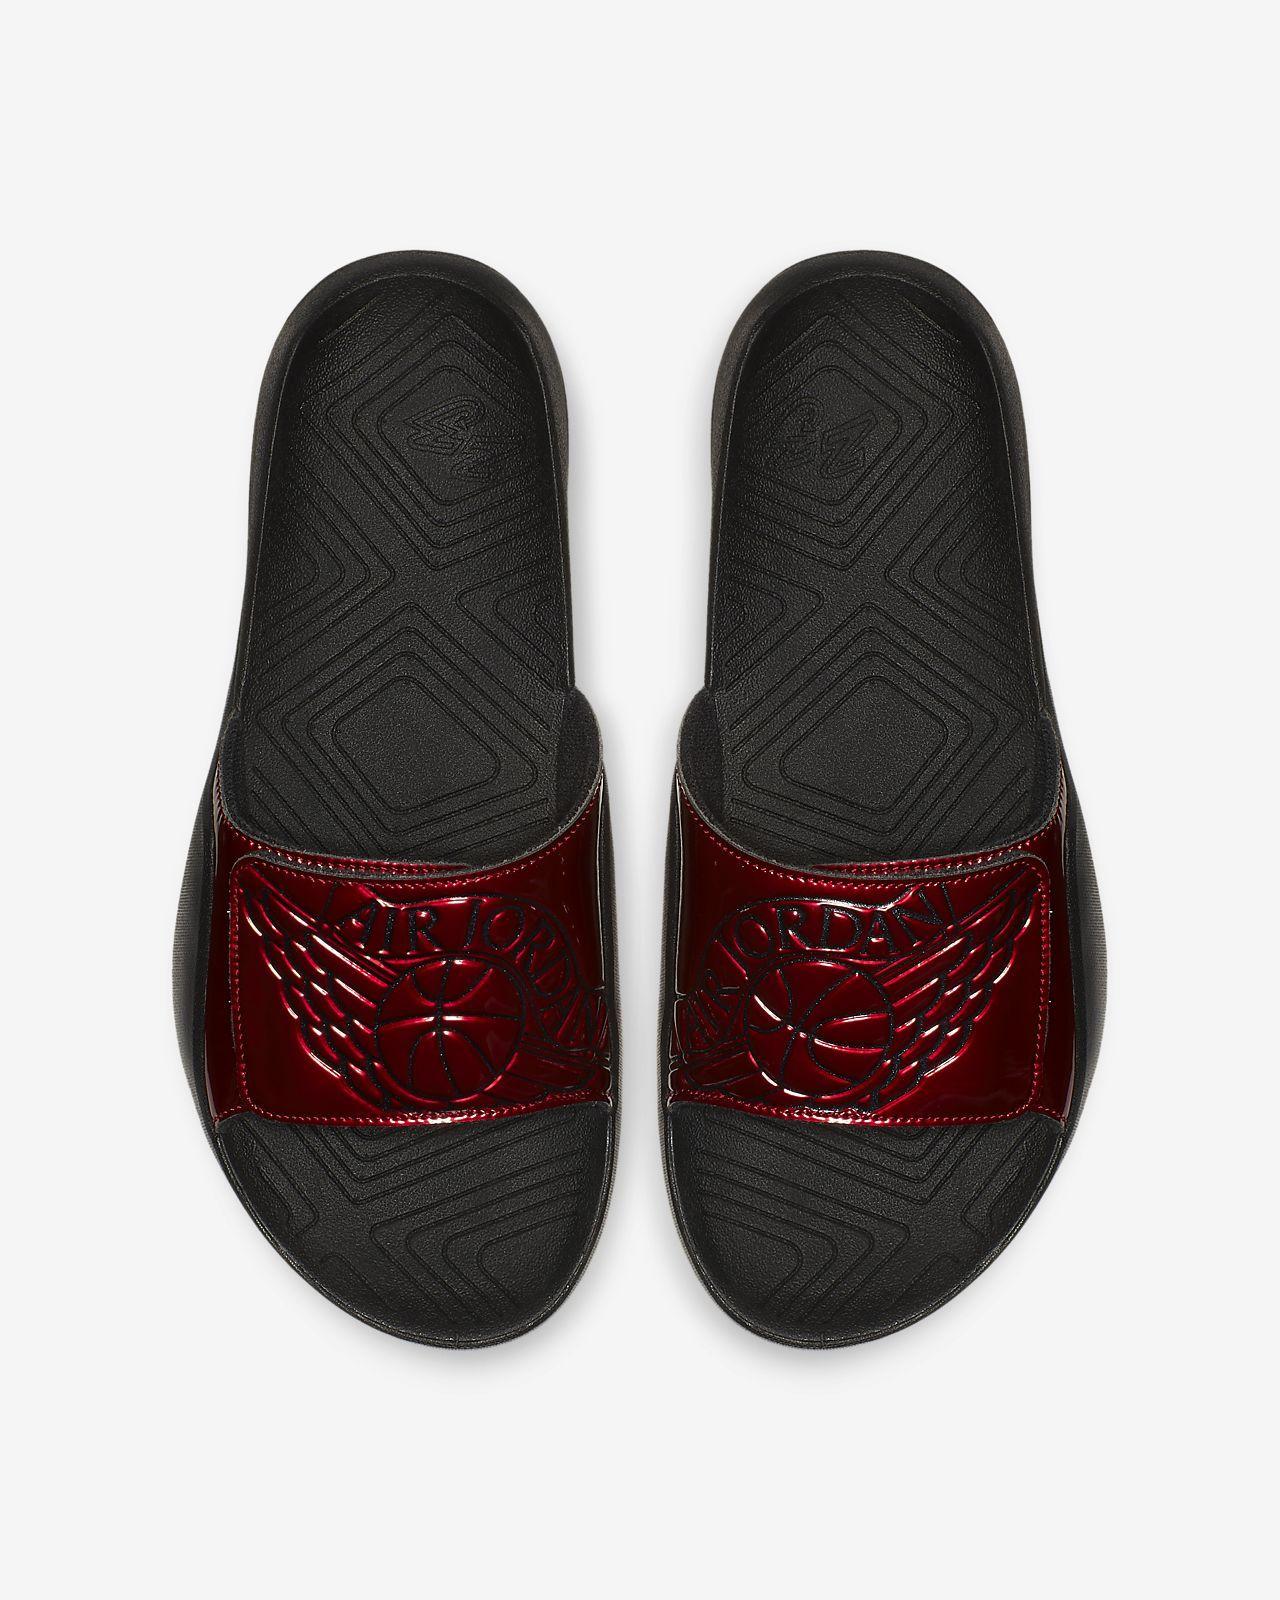 6a2910e7d81f Jordan Hydro 7 Men s Slide